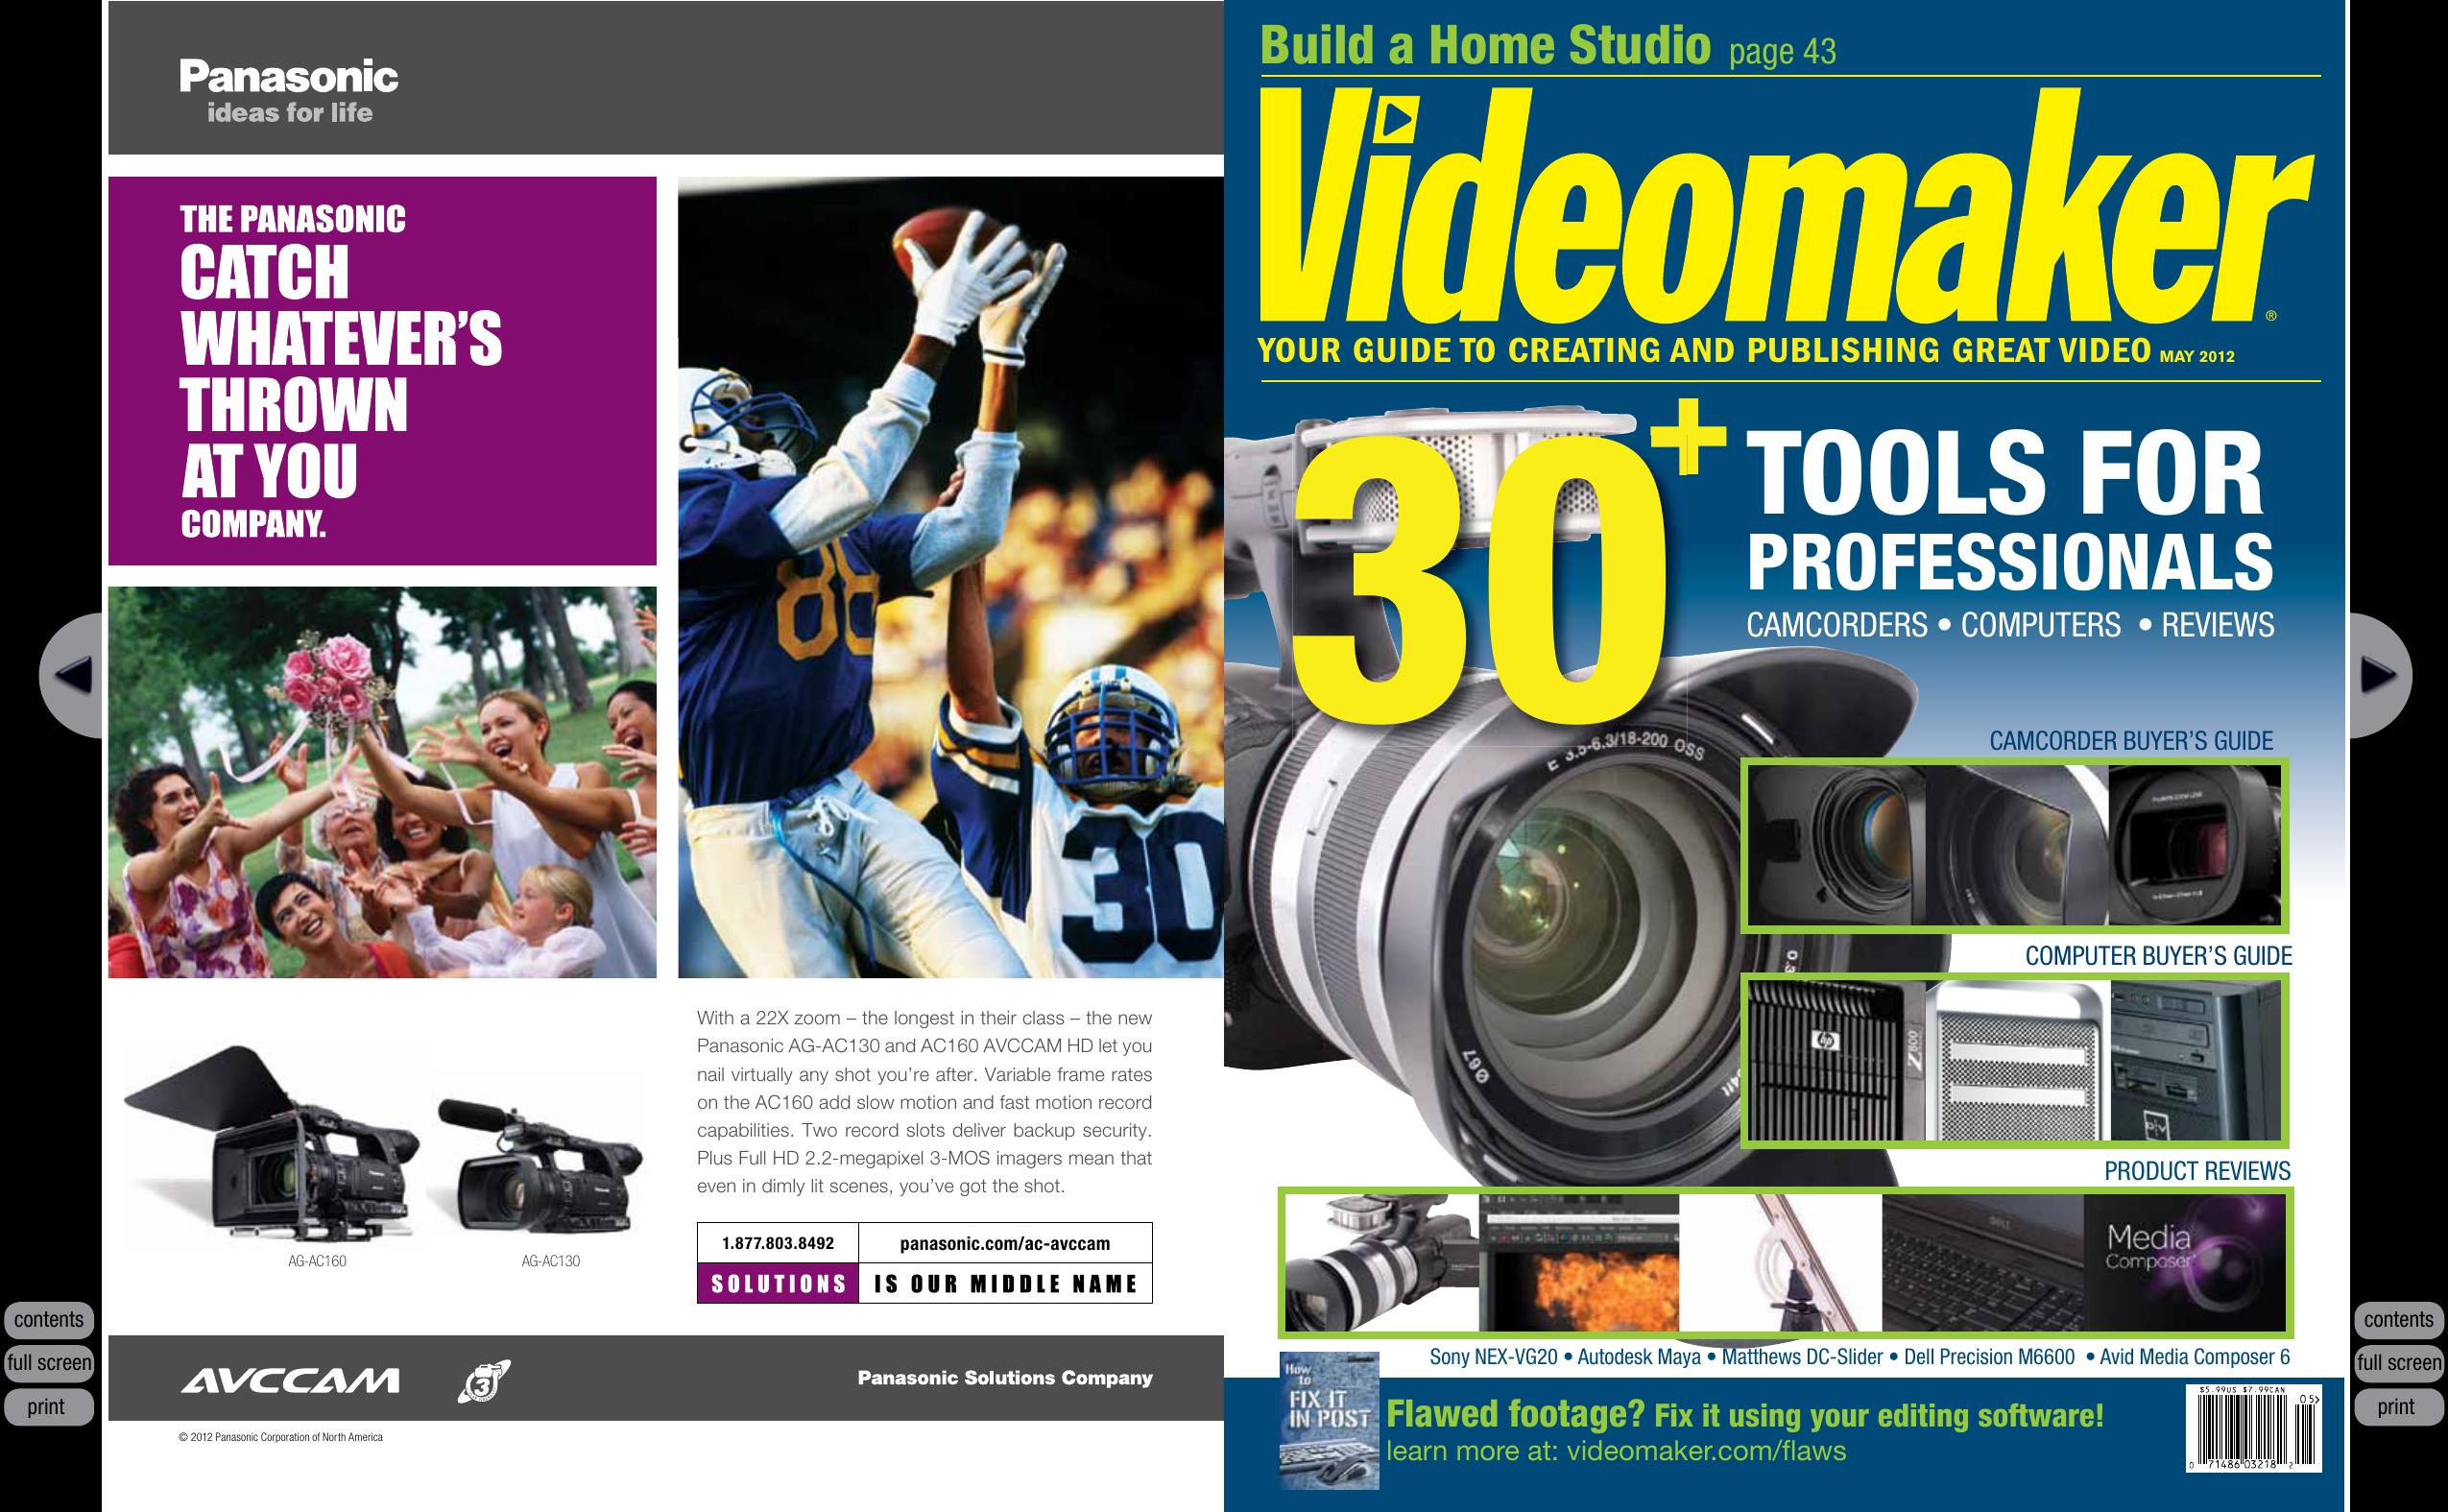 1//4 Screw Interface Digital Camera Desktop Extension Mini Tripod Camera Accessories for GoPro Universal Cameras rowna Handle Tripod